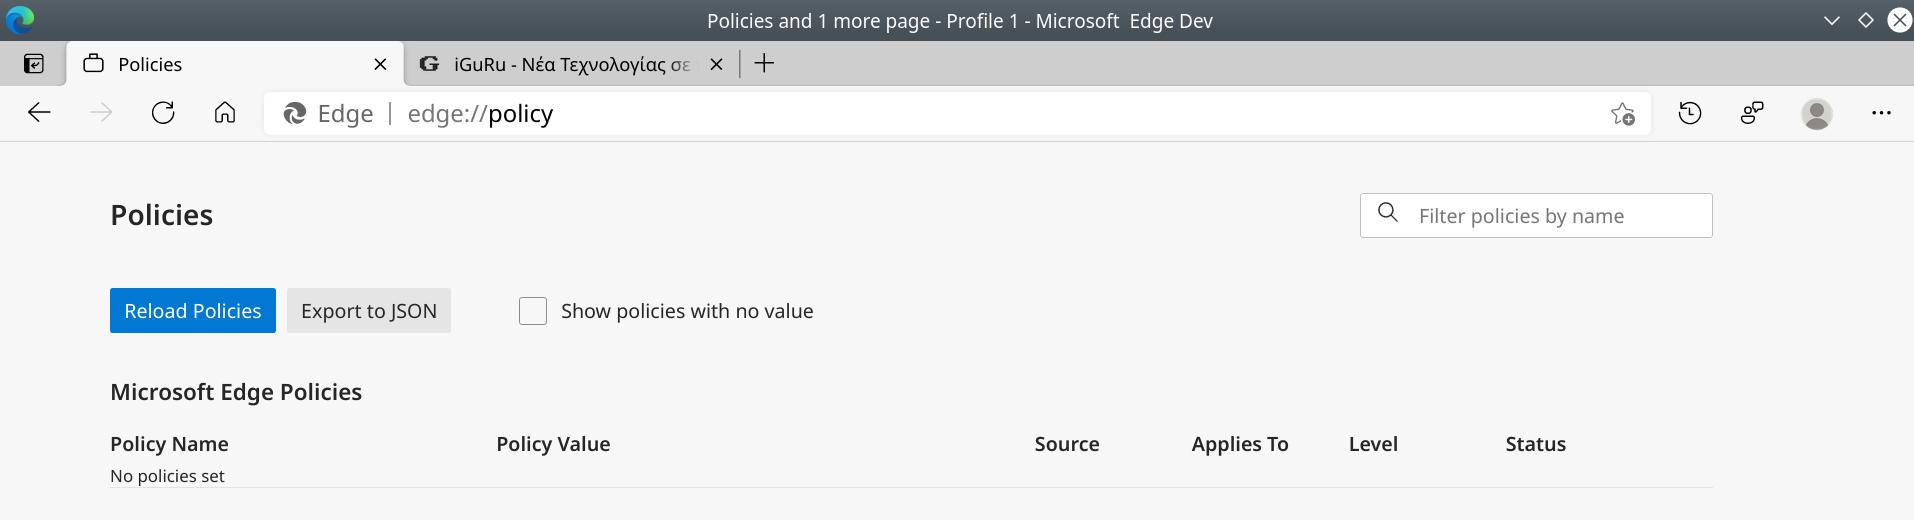 Screenshot 2021 03 21 16 02 41 - Η διαχείριση του browser σας γίνεται από τον οργανισμό σας